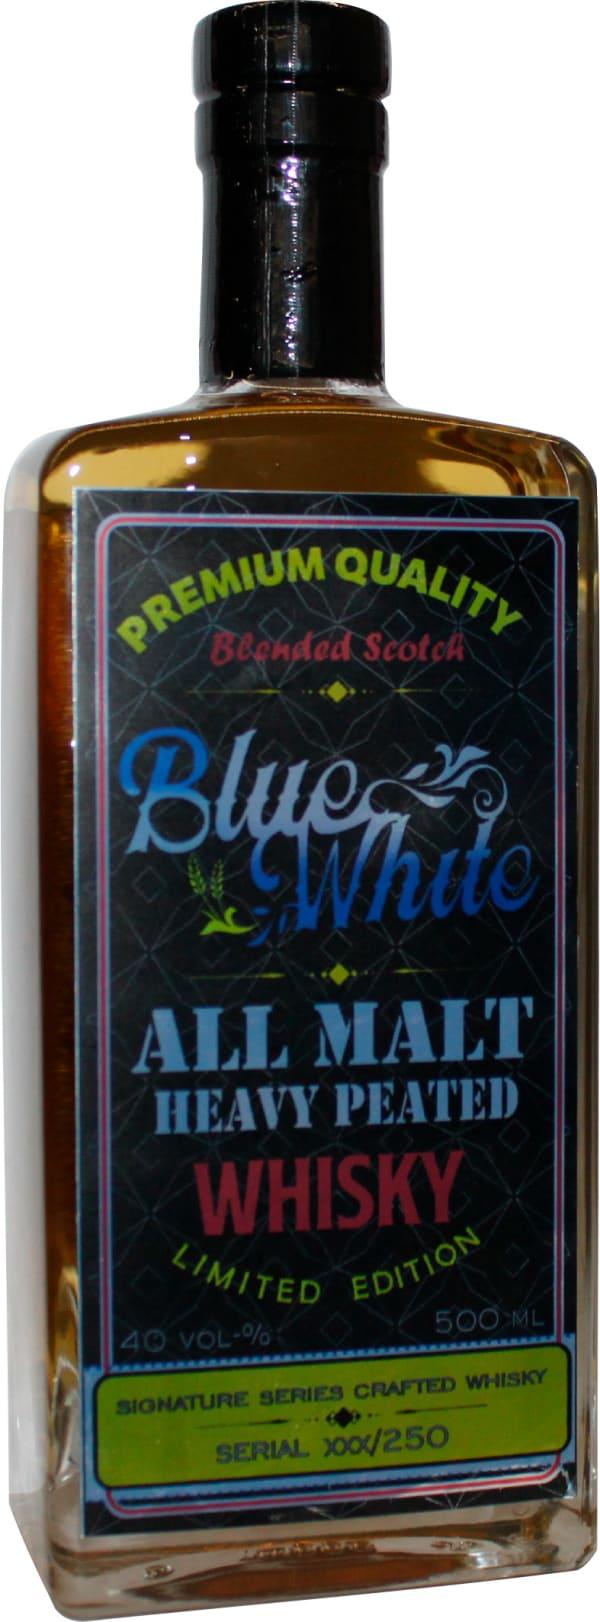 BlueWhite All Malt Heavy Peated